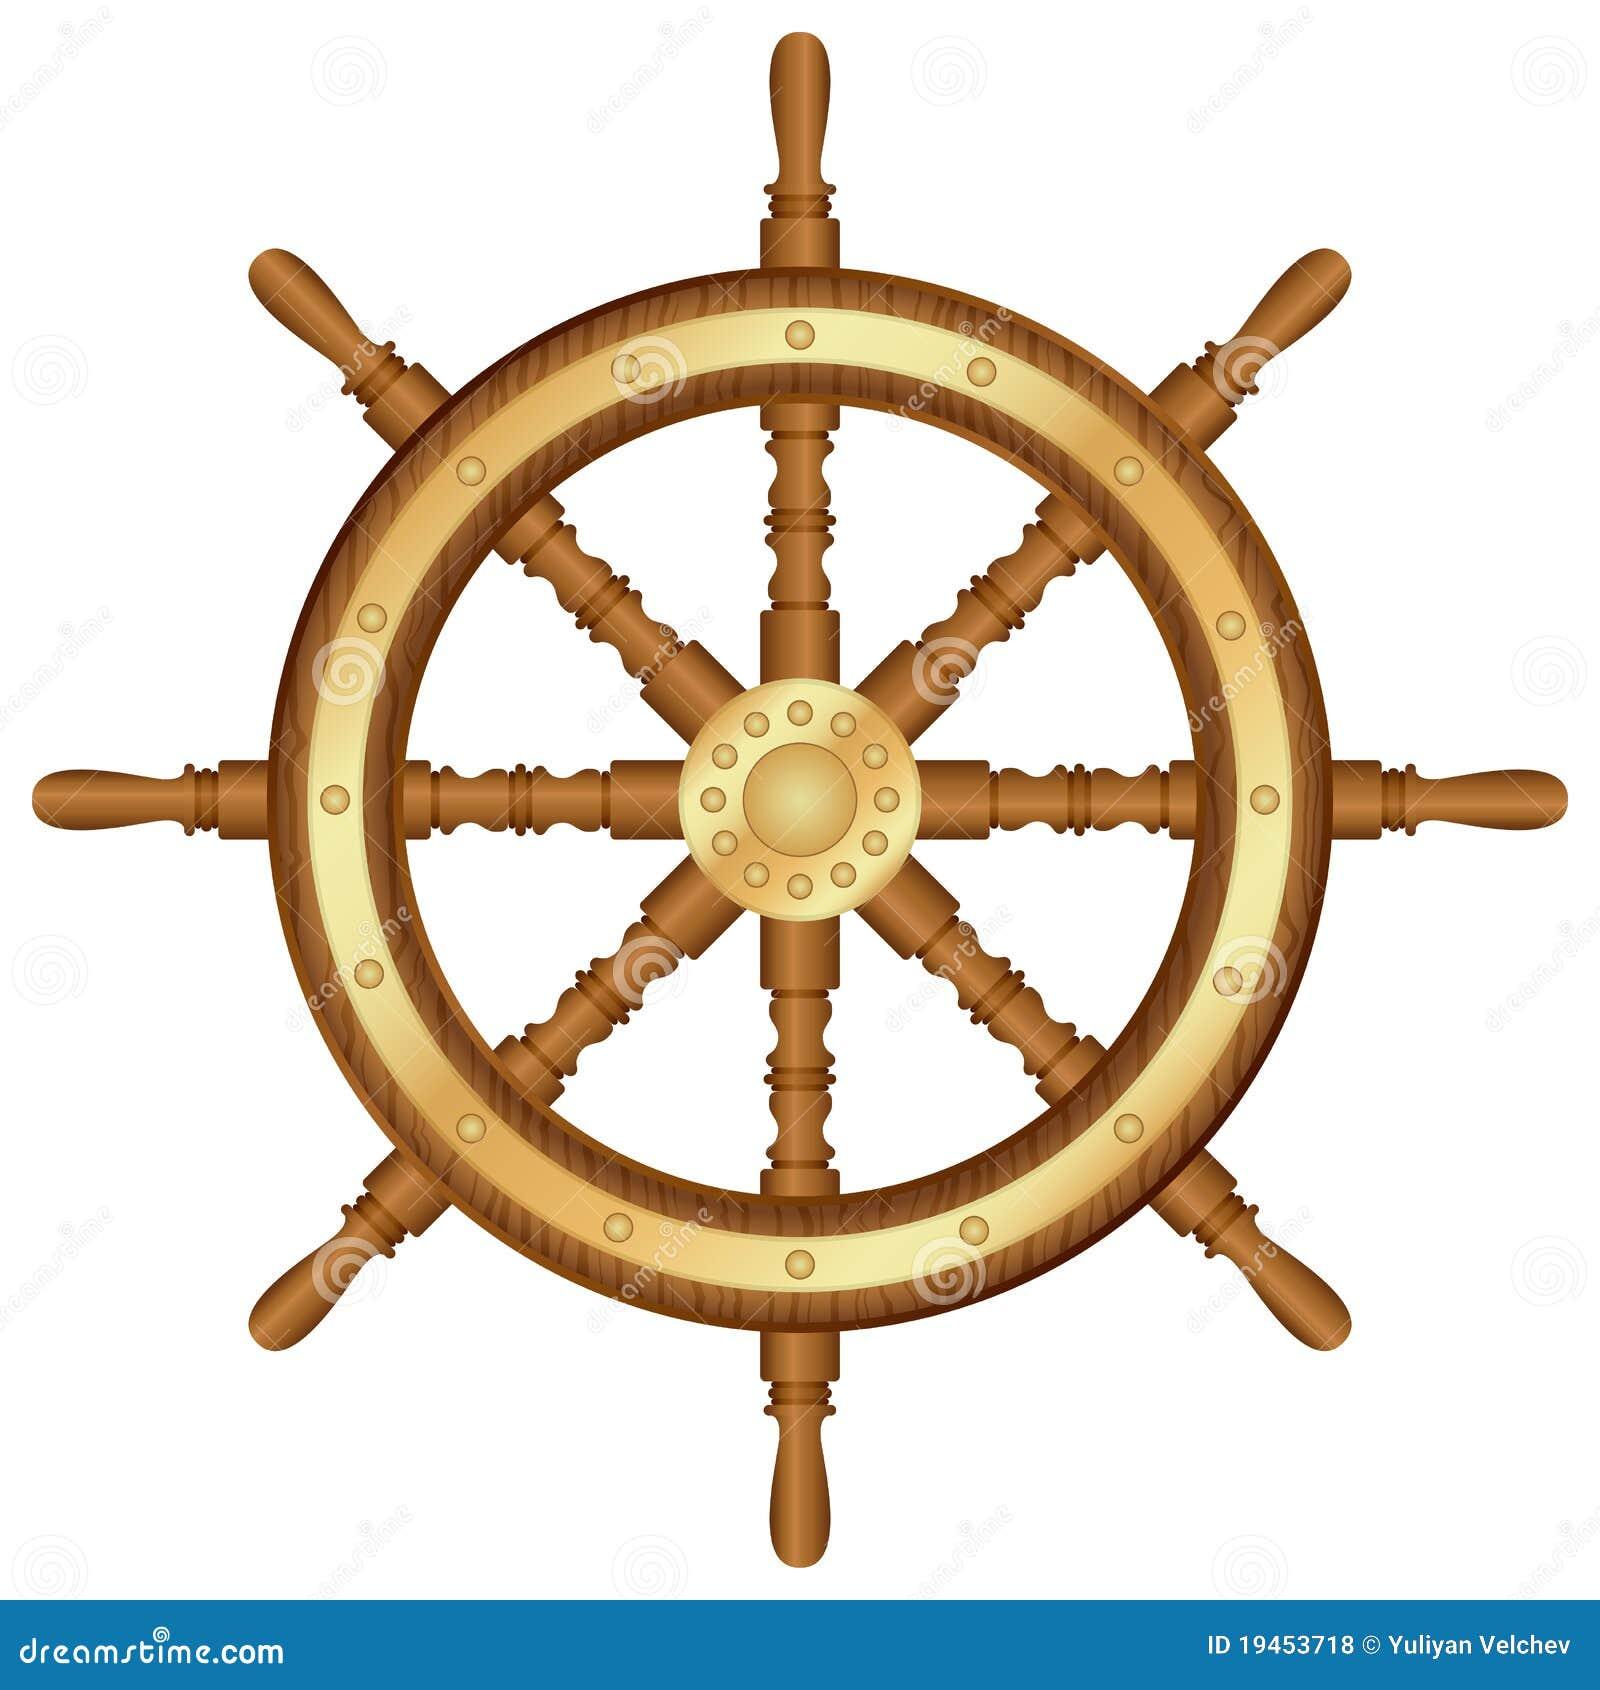 Helm wheel stock vector. Image of wooden, helm, white - 19453718